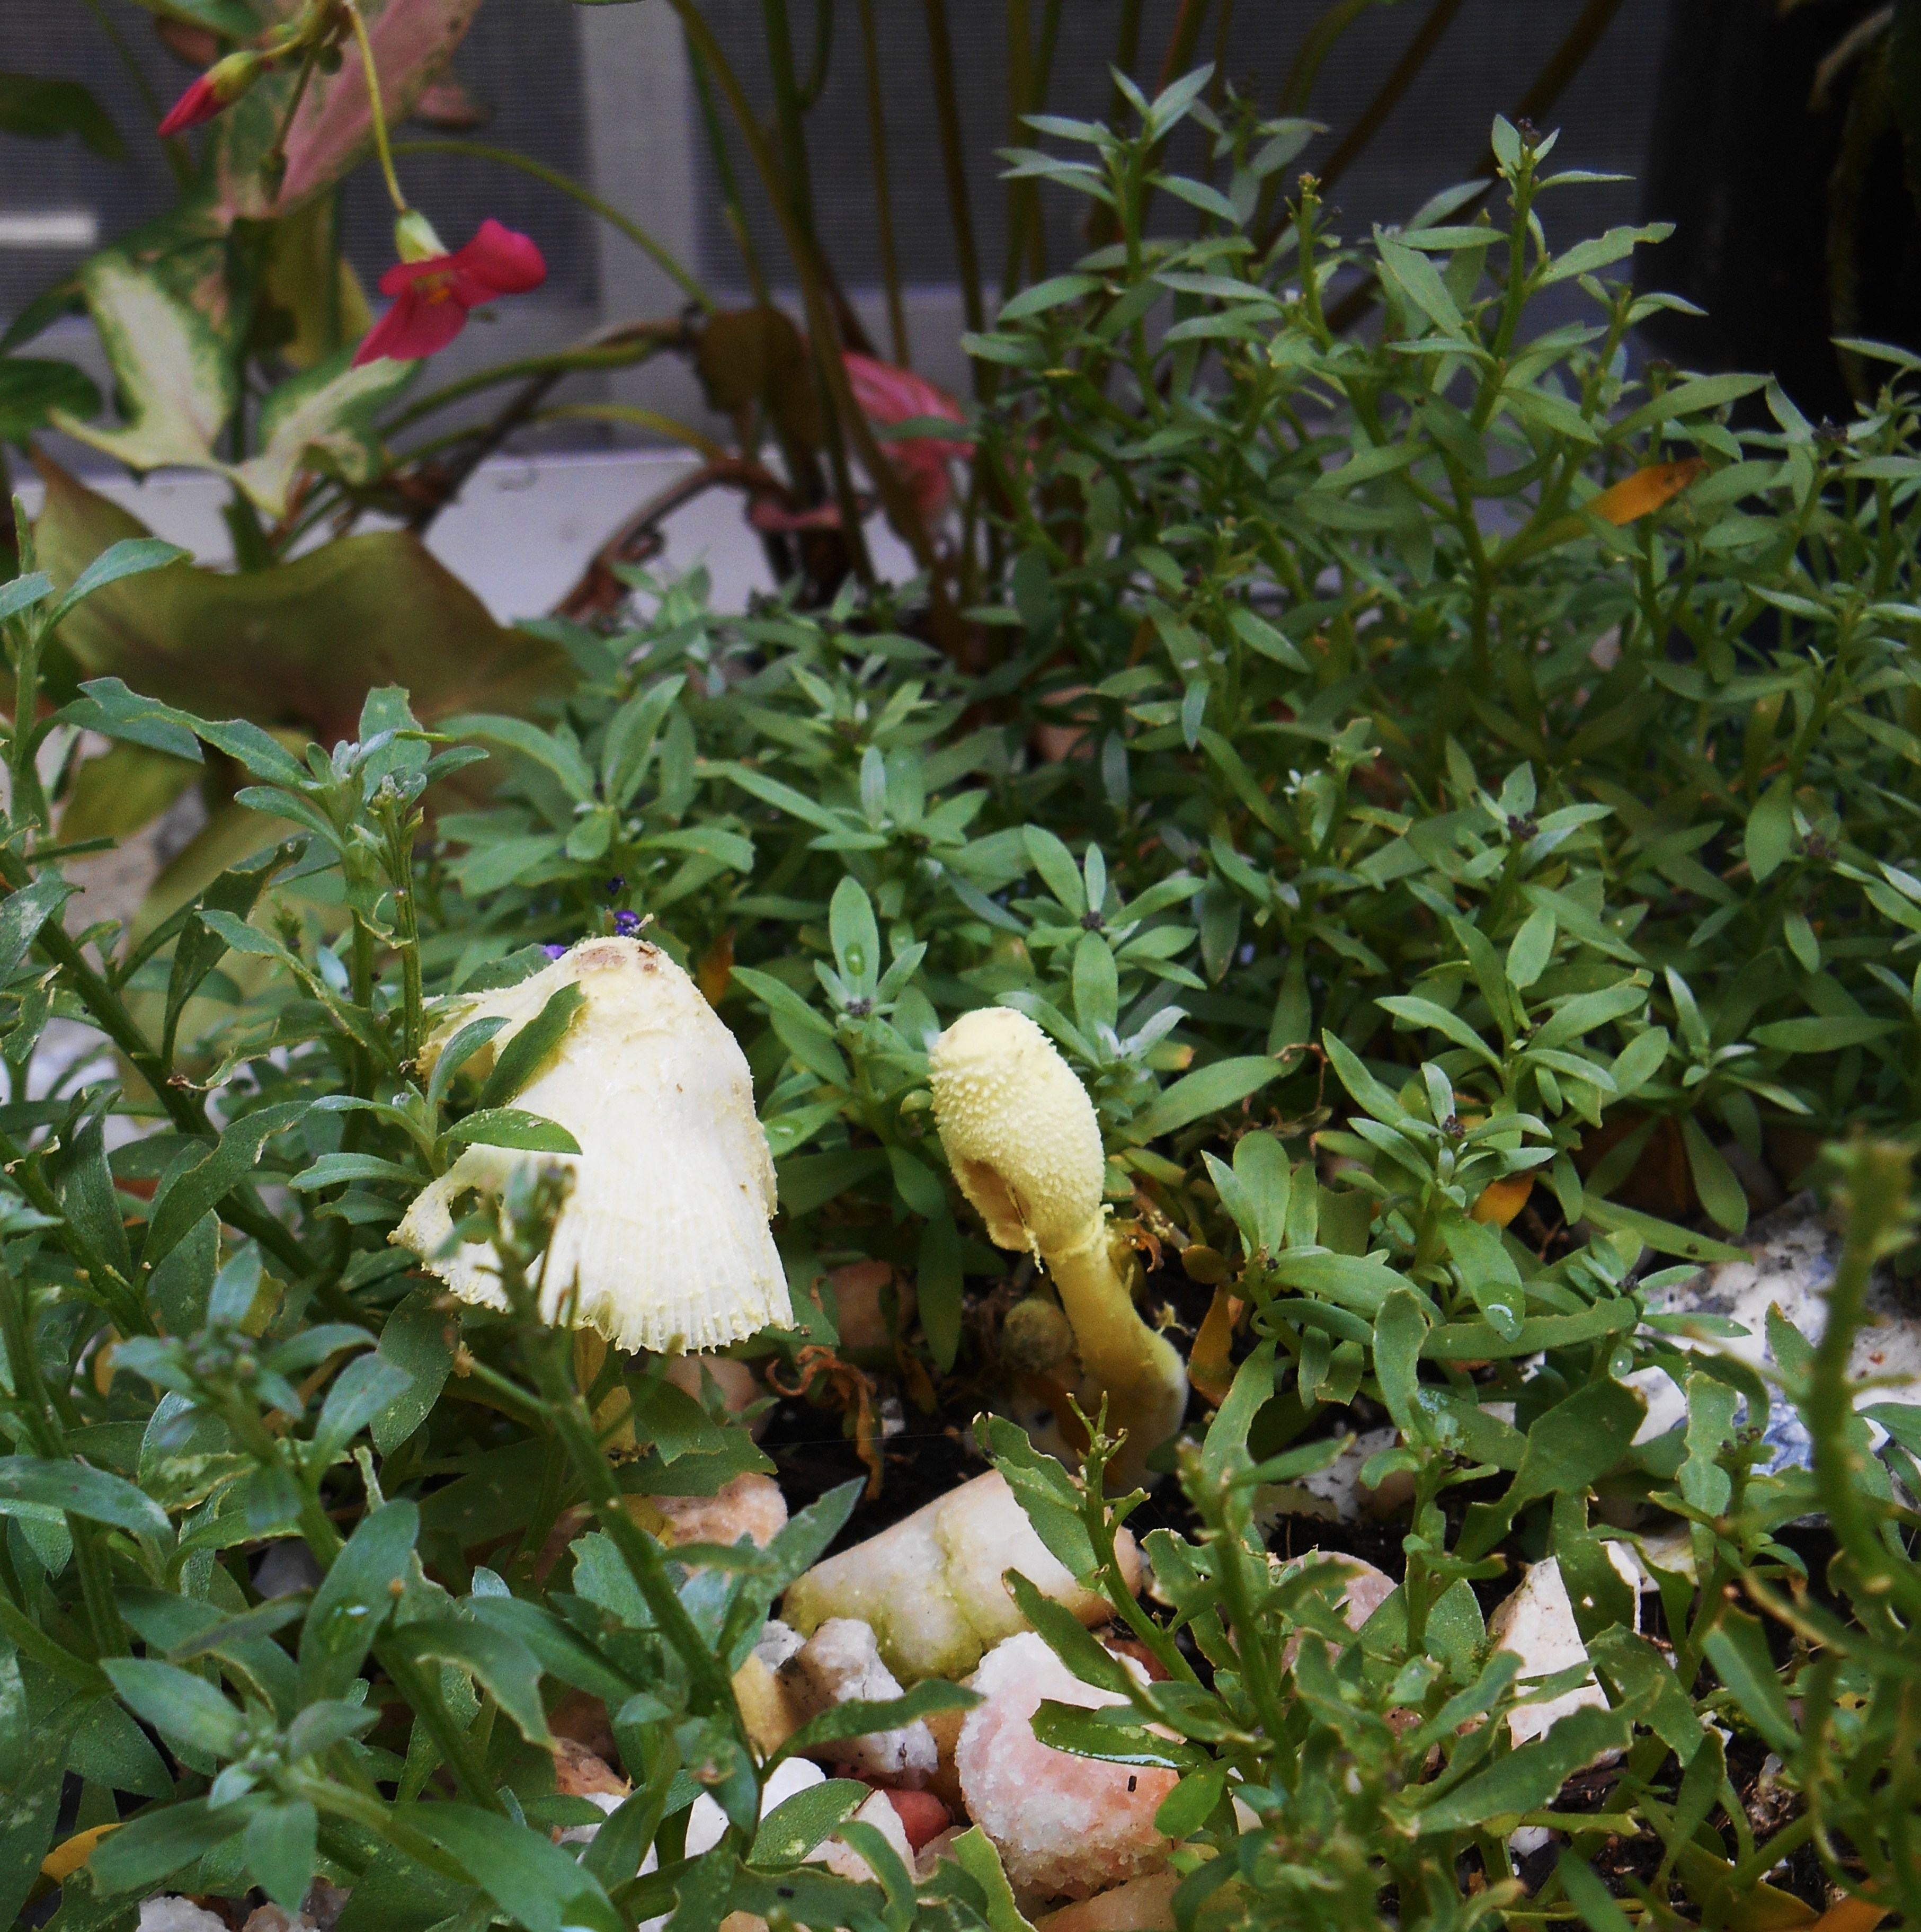 July 18, 2015 fungus 001